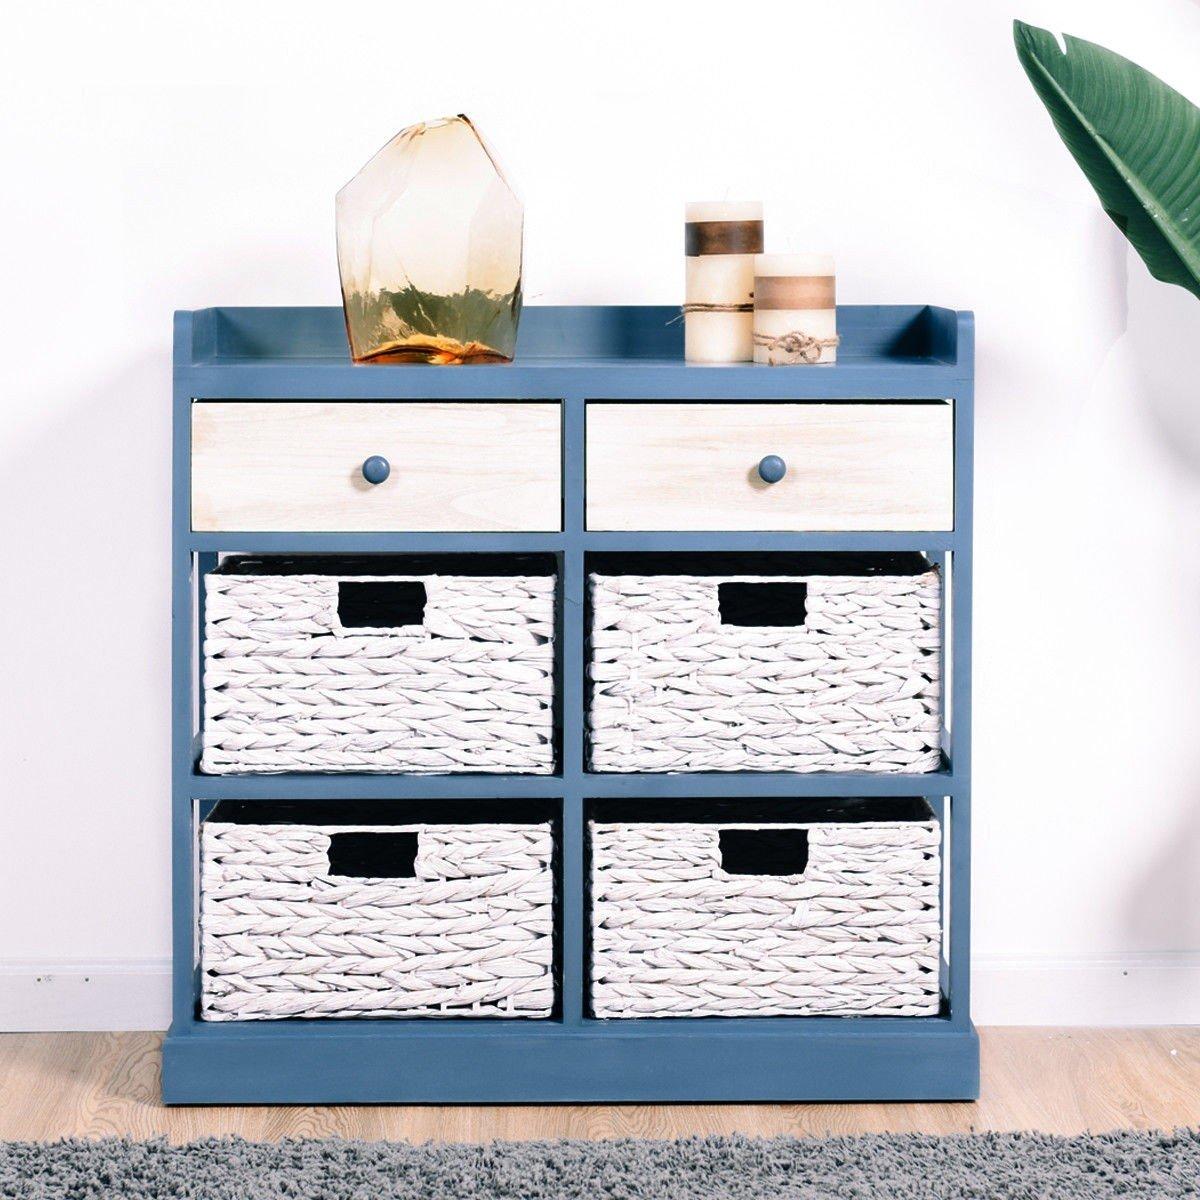 BESTChoiceForYou Cabinet Table Storage Side Wood Drawers Console Sideboard Cupboard W Furniture End Vidaxl White Baskets Drawer Door Home by BESTChoiceForYou (Image #4)